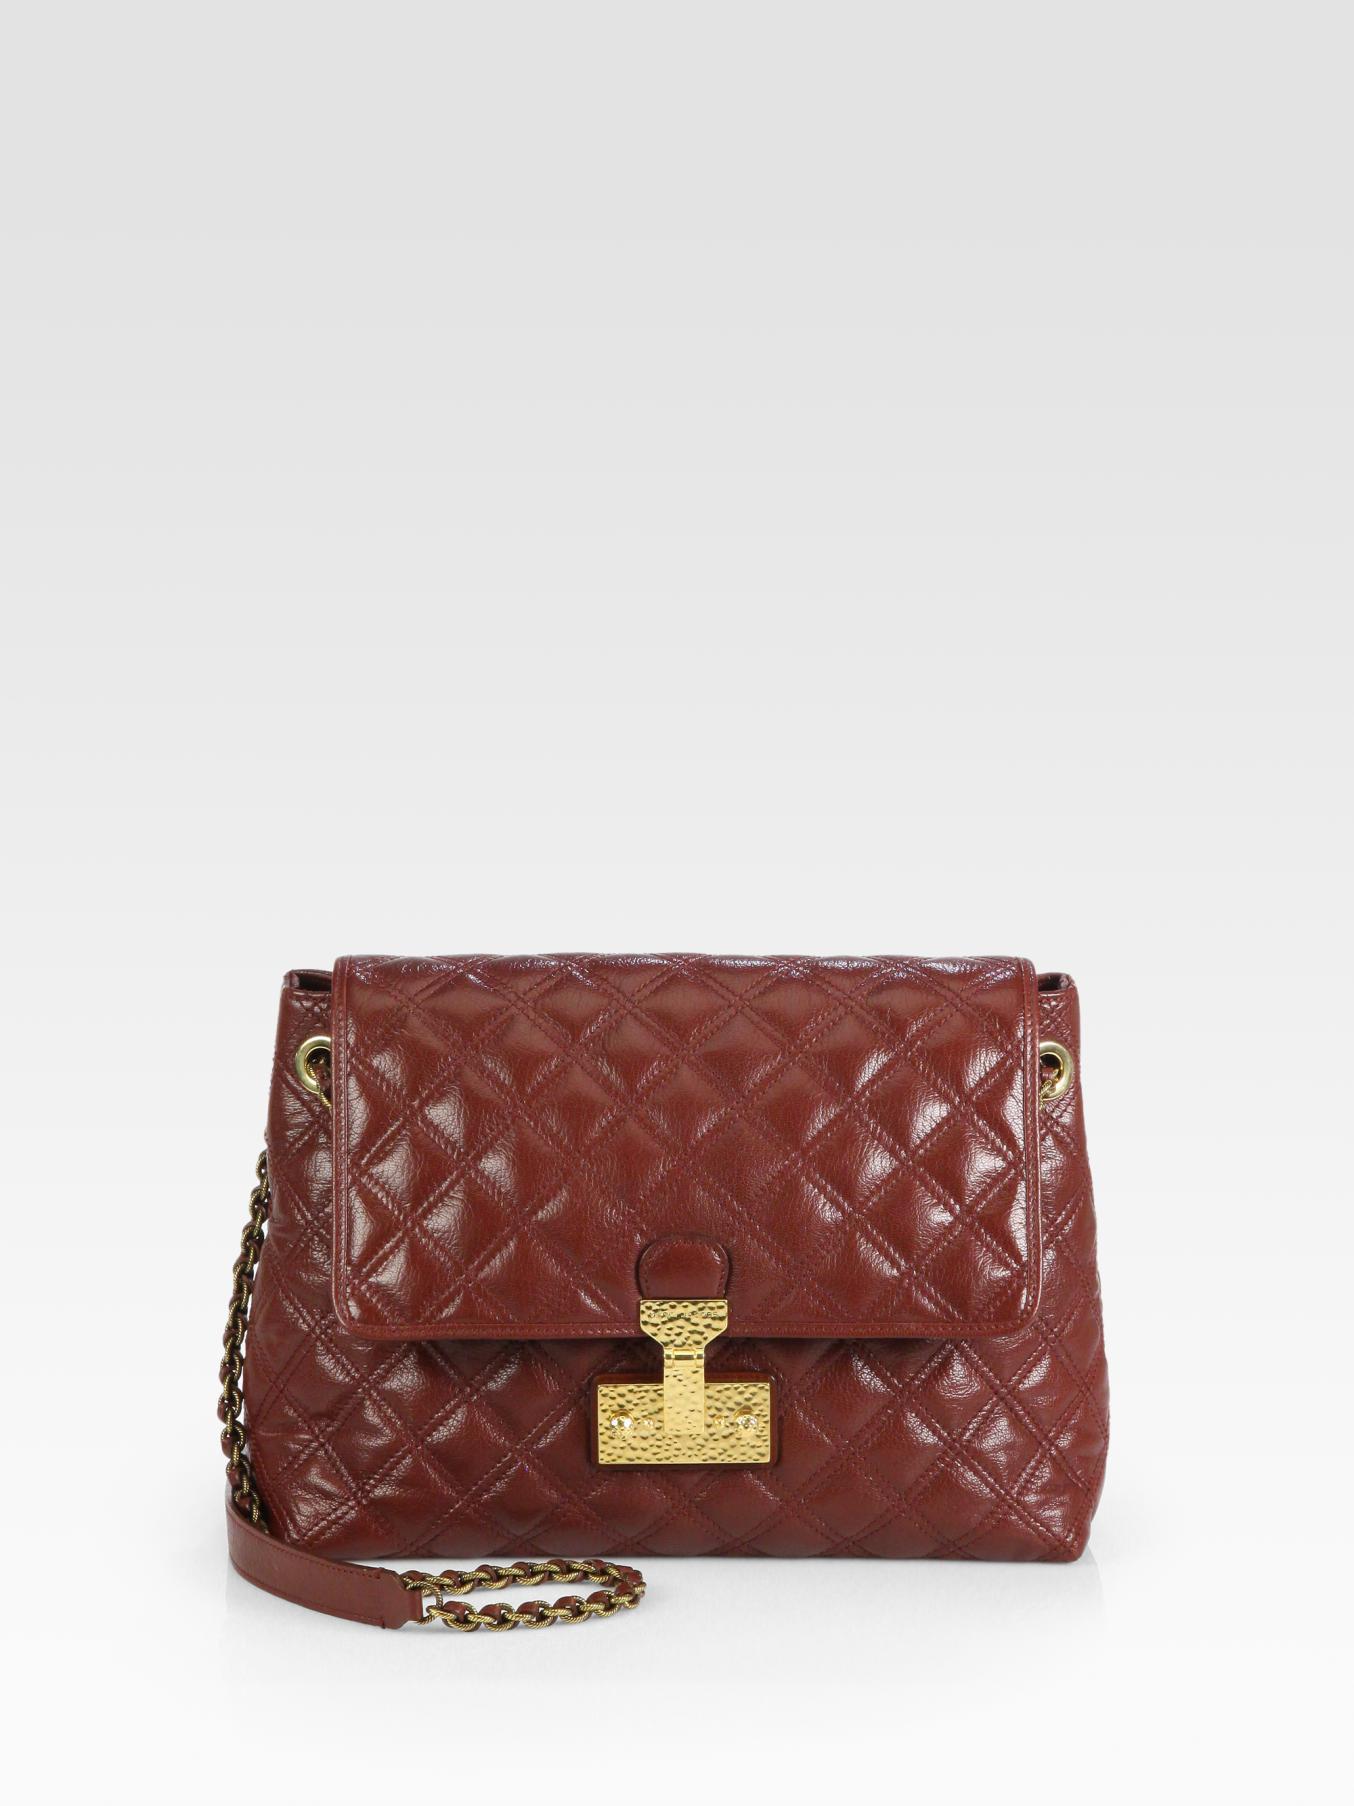 044eefc42392 Lyst - Marc Jacobs Baroque Xl Single Quilted Shoulder Bag in Brown